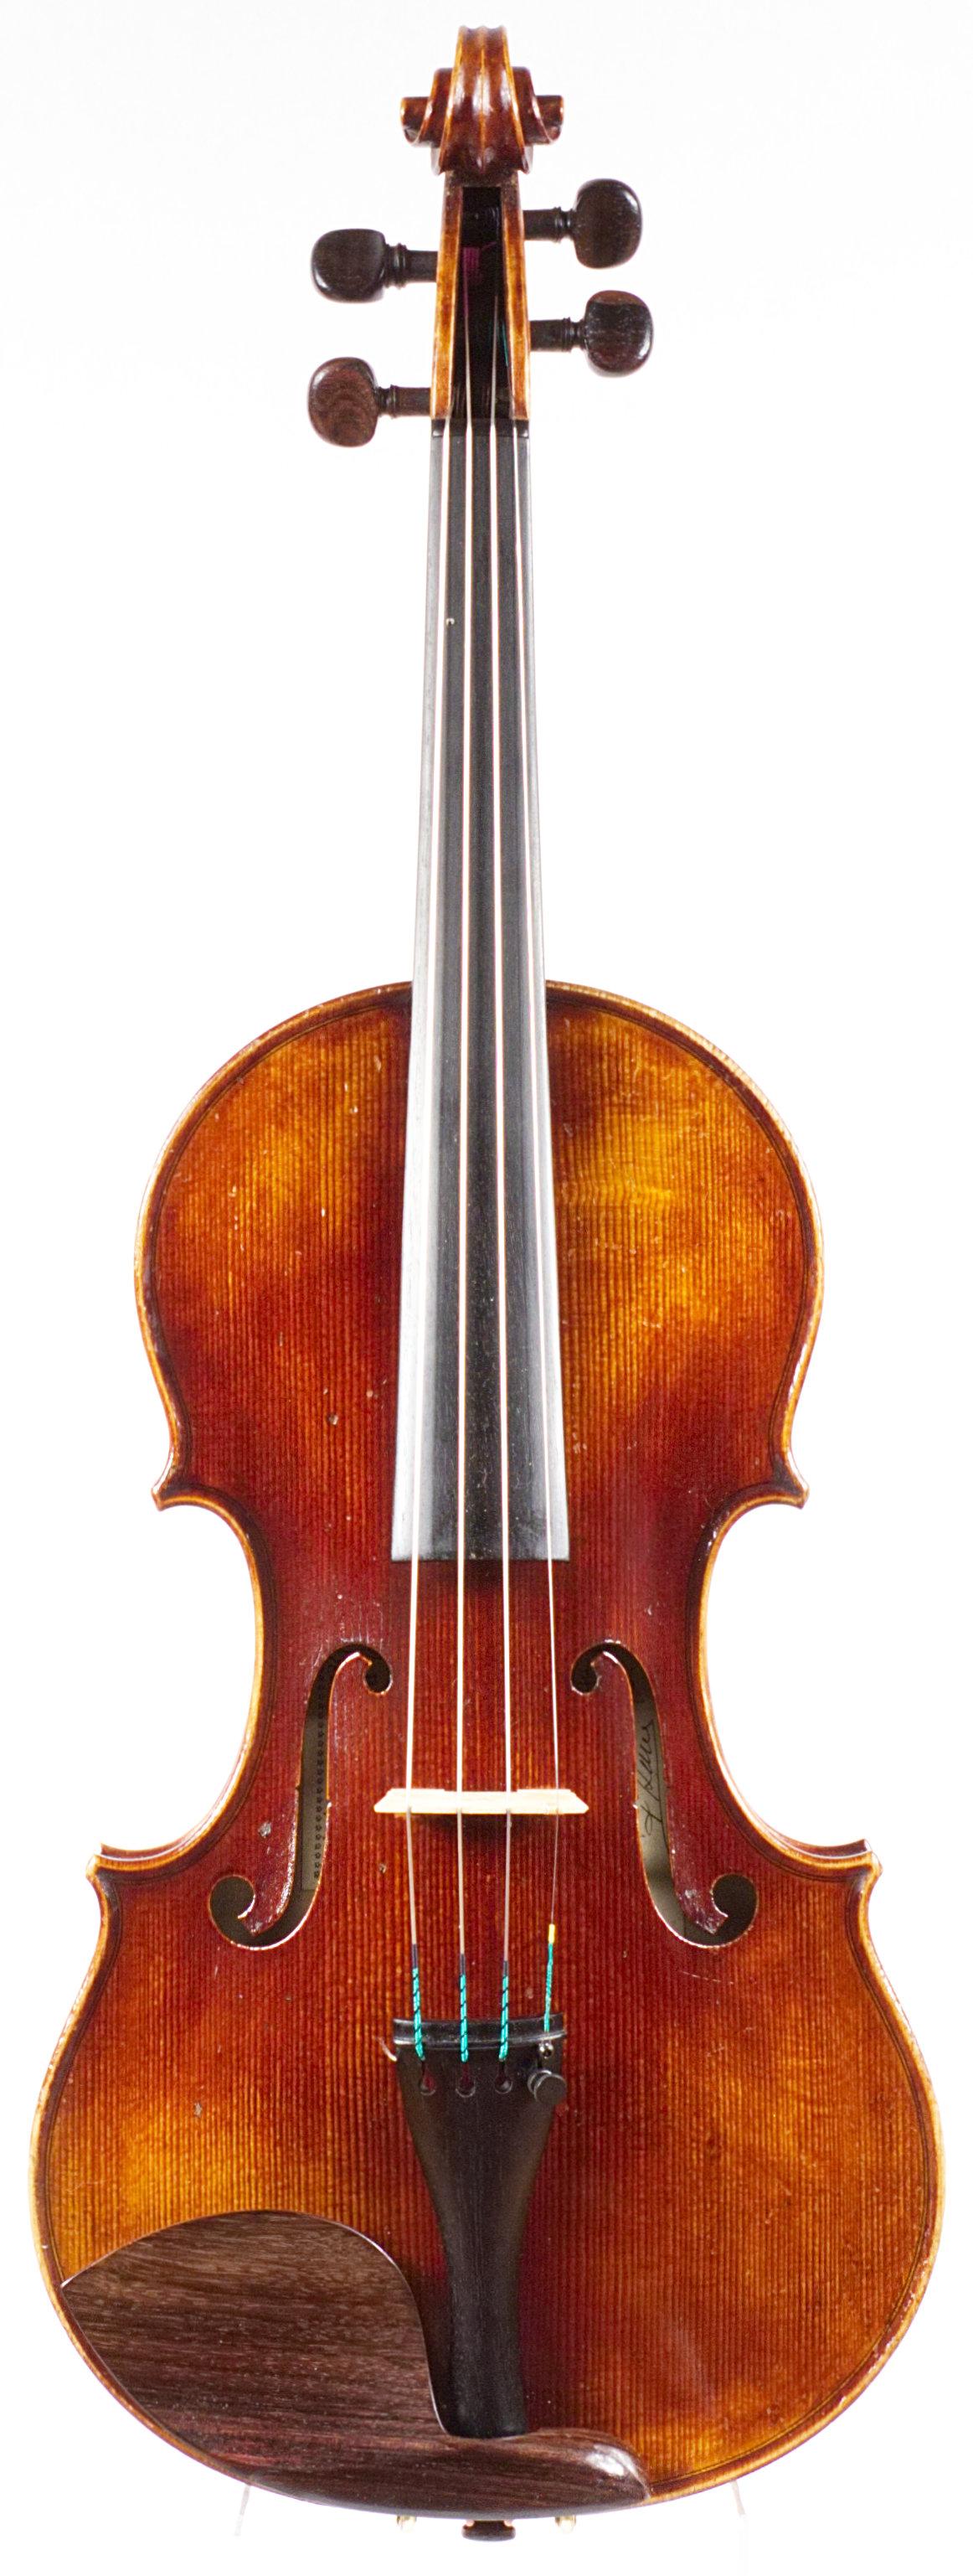 Paul Kaul violin